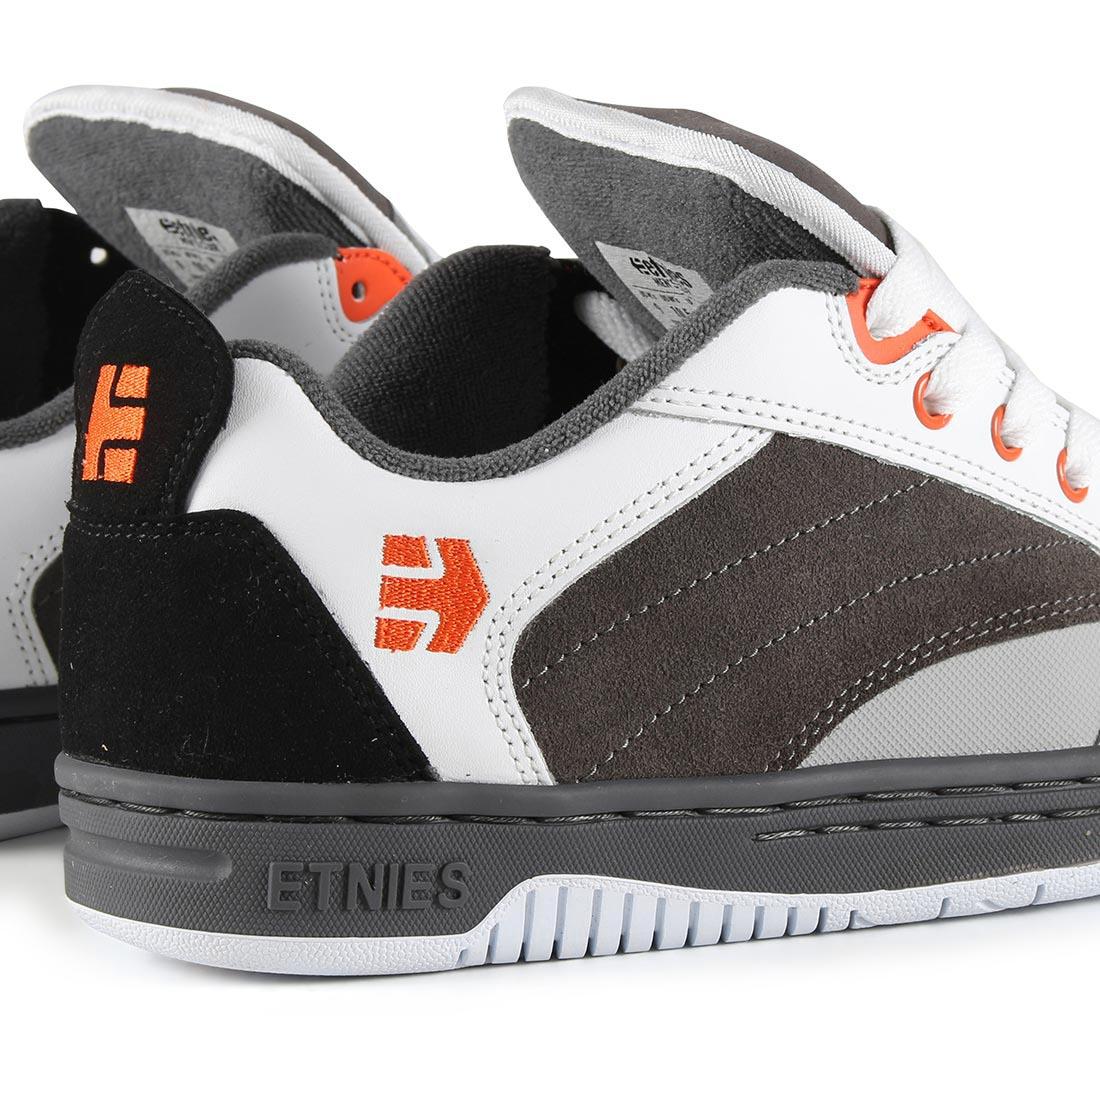 Etnies Czar Shoes - Grey White Orange